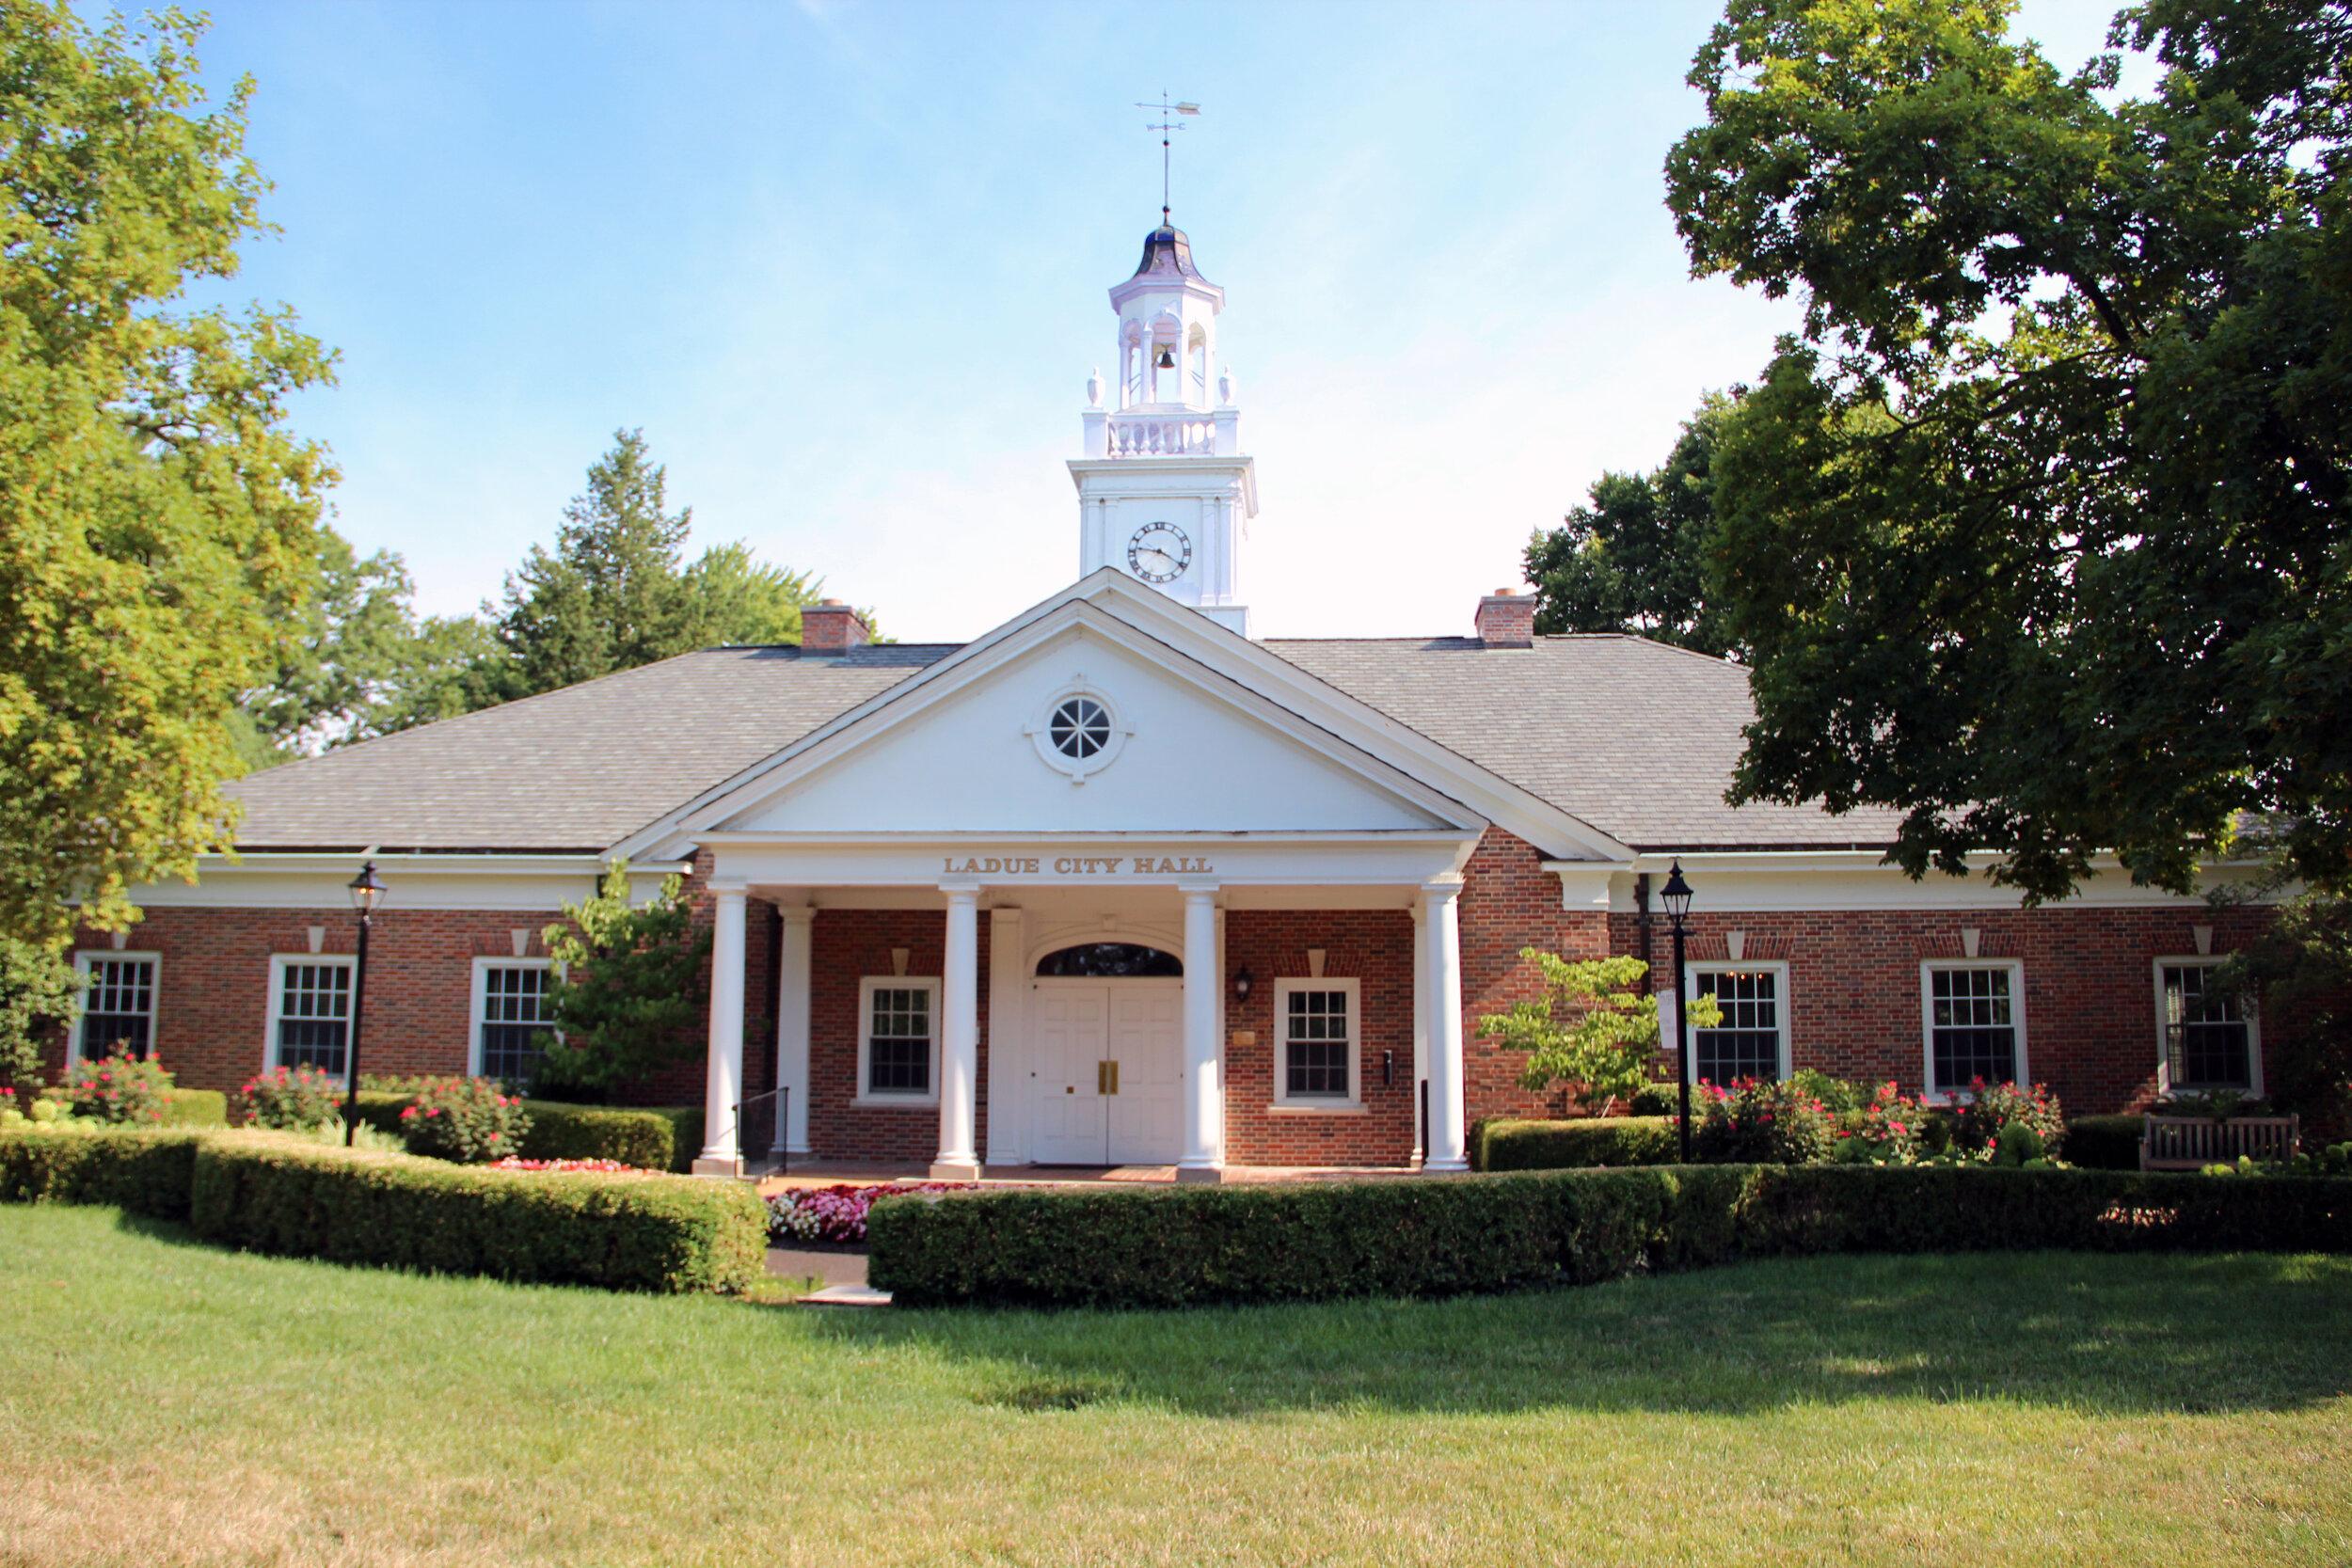 Ladue City Hall Exterior